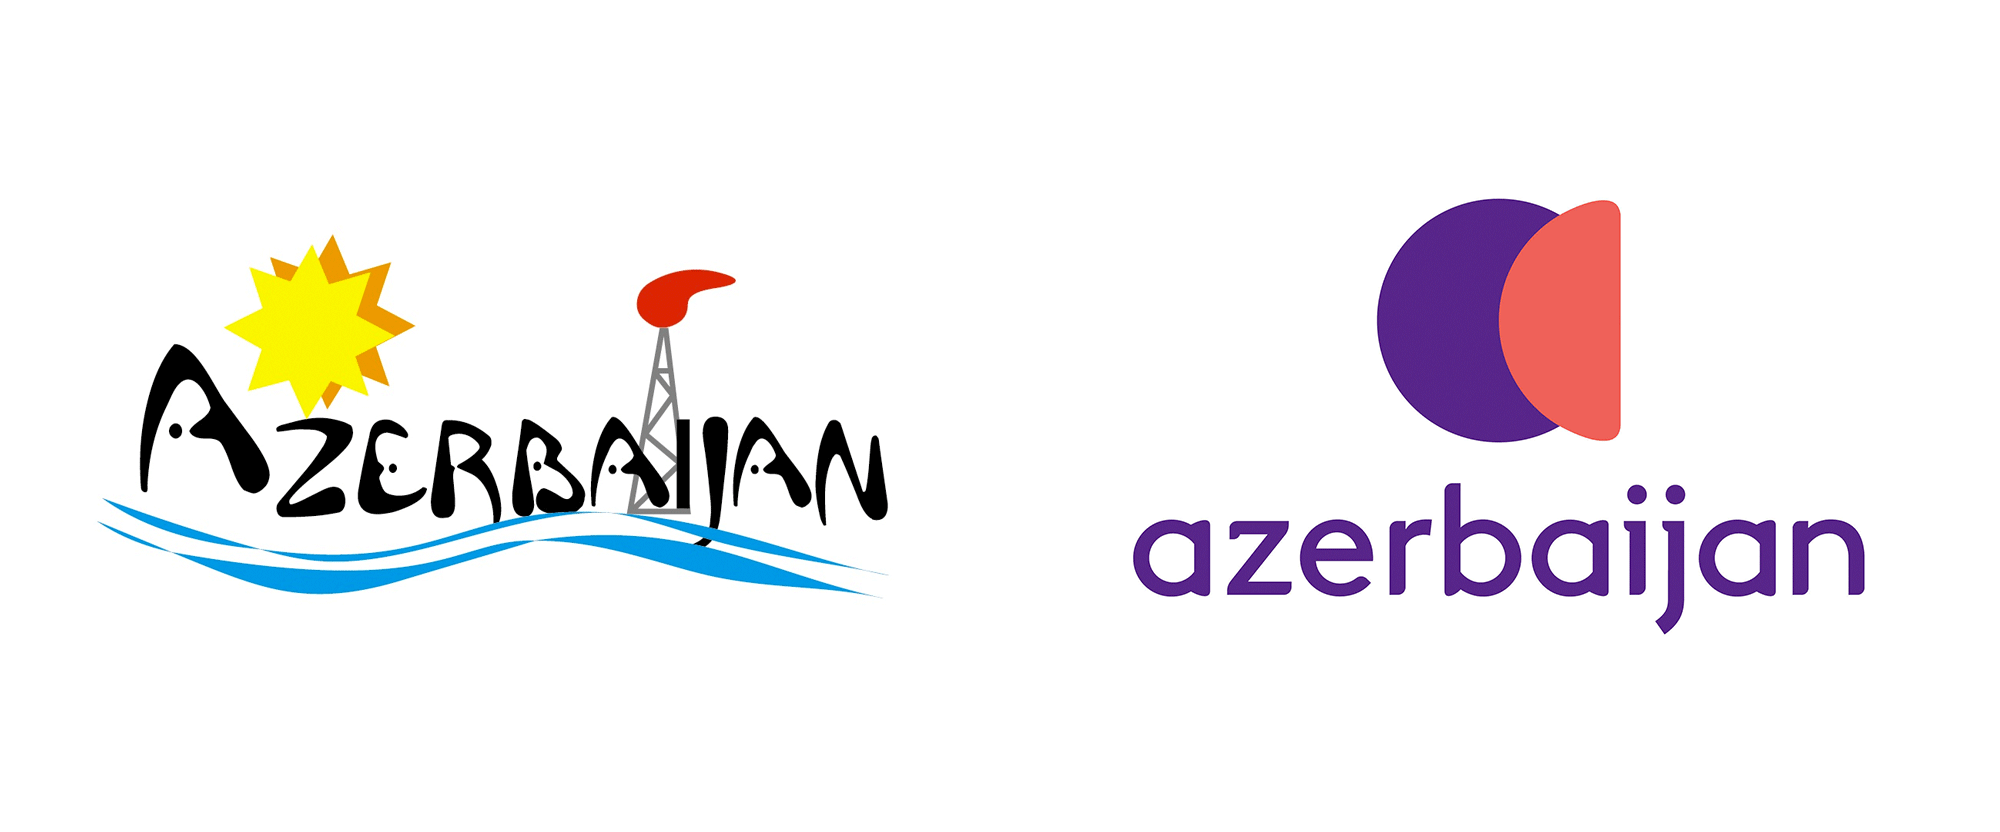 New Logo for Azerbaijan (Tourism) by Landor